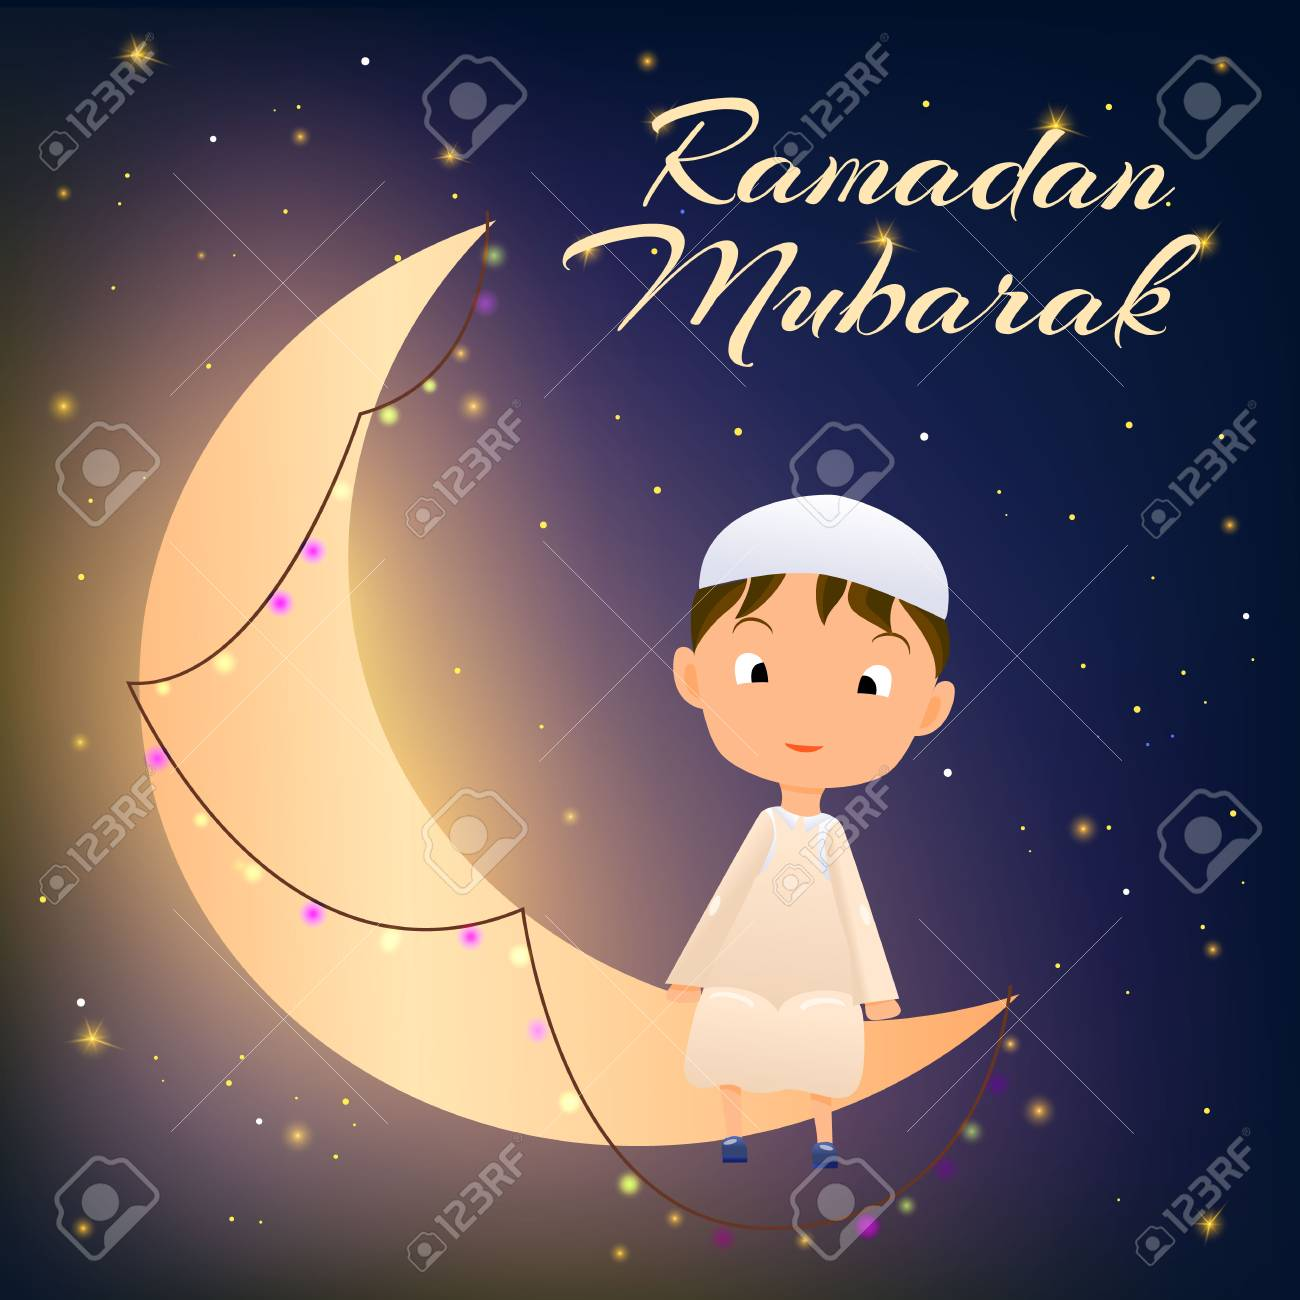 Ramadan kareem greeting card for muslim celebration ramazanhappy ramadan kareem greeting card for muslim celebration ramazanhappy muslim kid on moon crescent card m4hsunfo